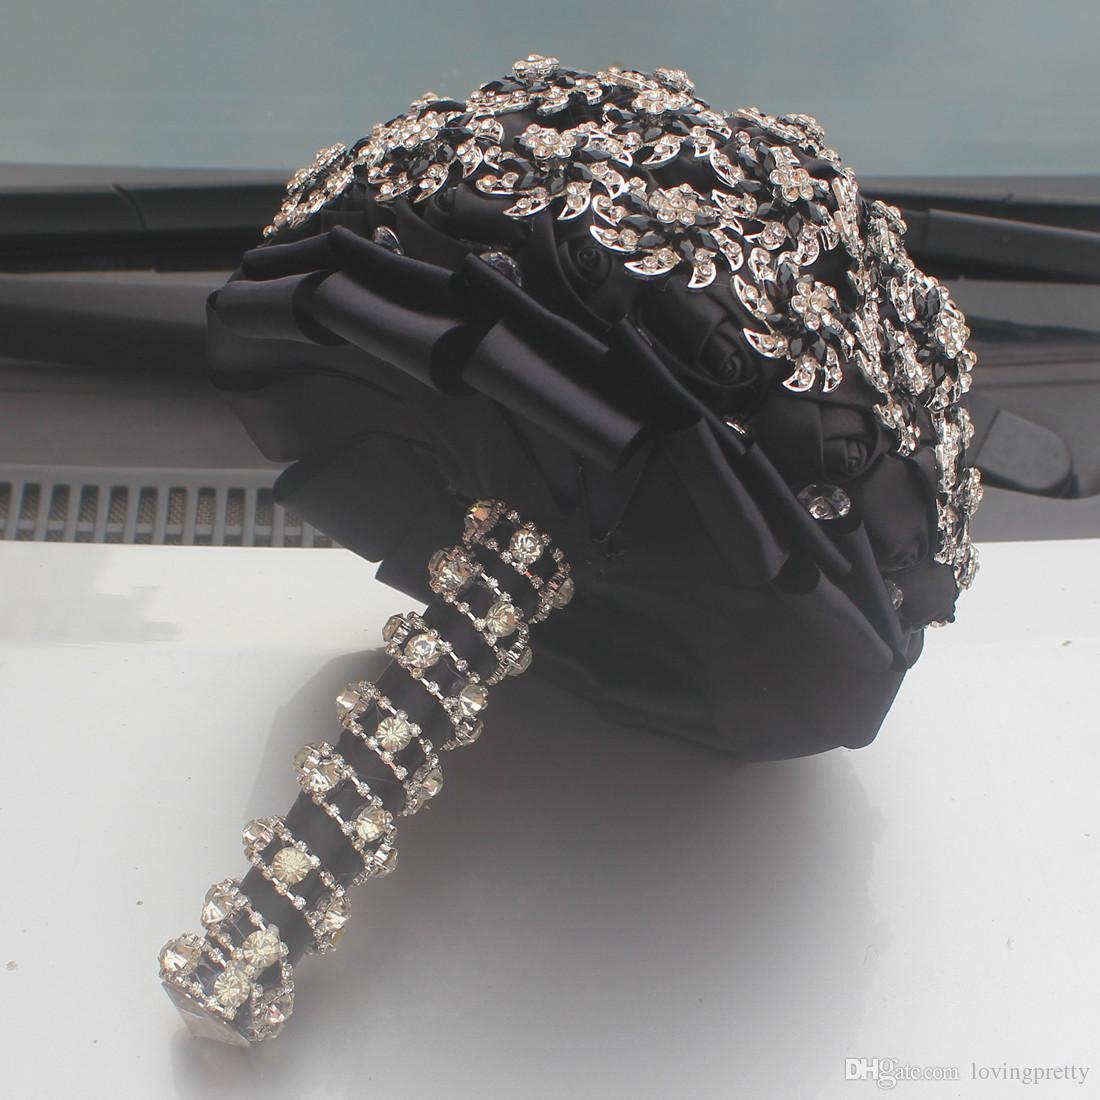 JaneVini Luxurious Bridal Bouquets For Wedding 2018 New Black Crystal Beaded Bride Flowers Brooch Bouquet Boeket Kunstbloemen Buque De Noiva